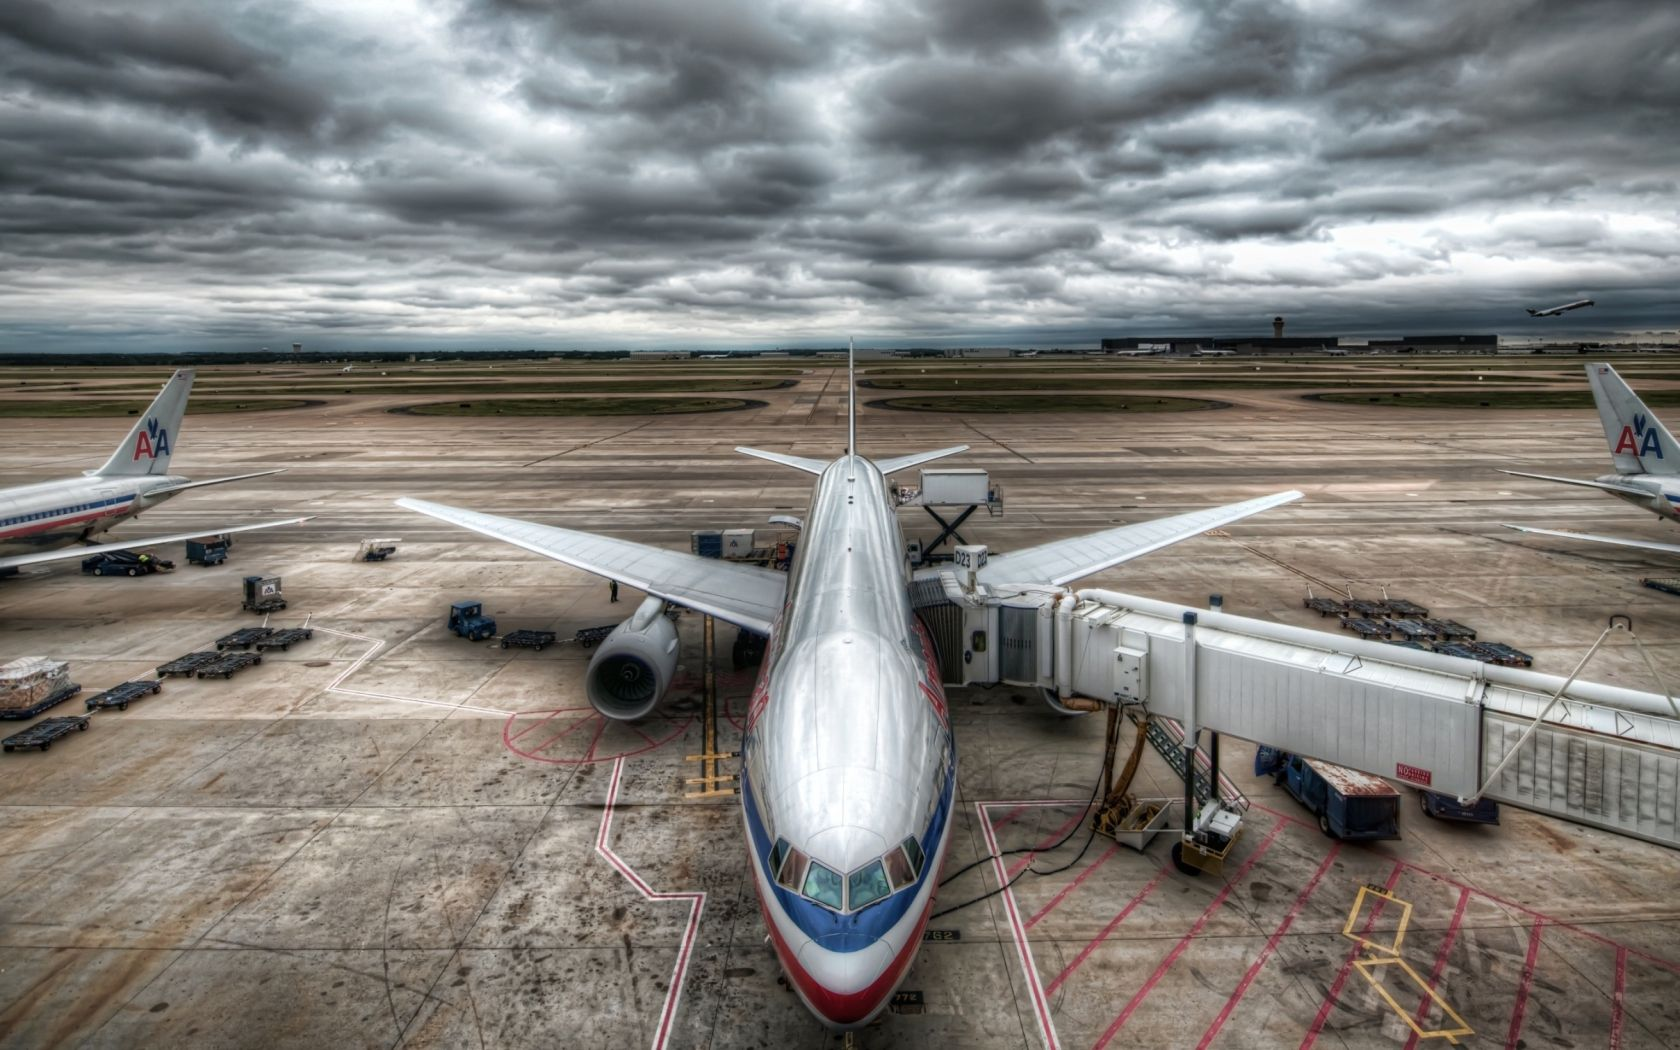 Plane Sky Airport